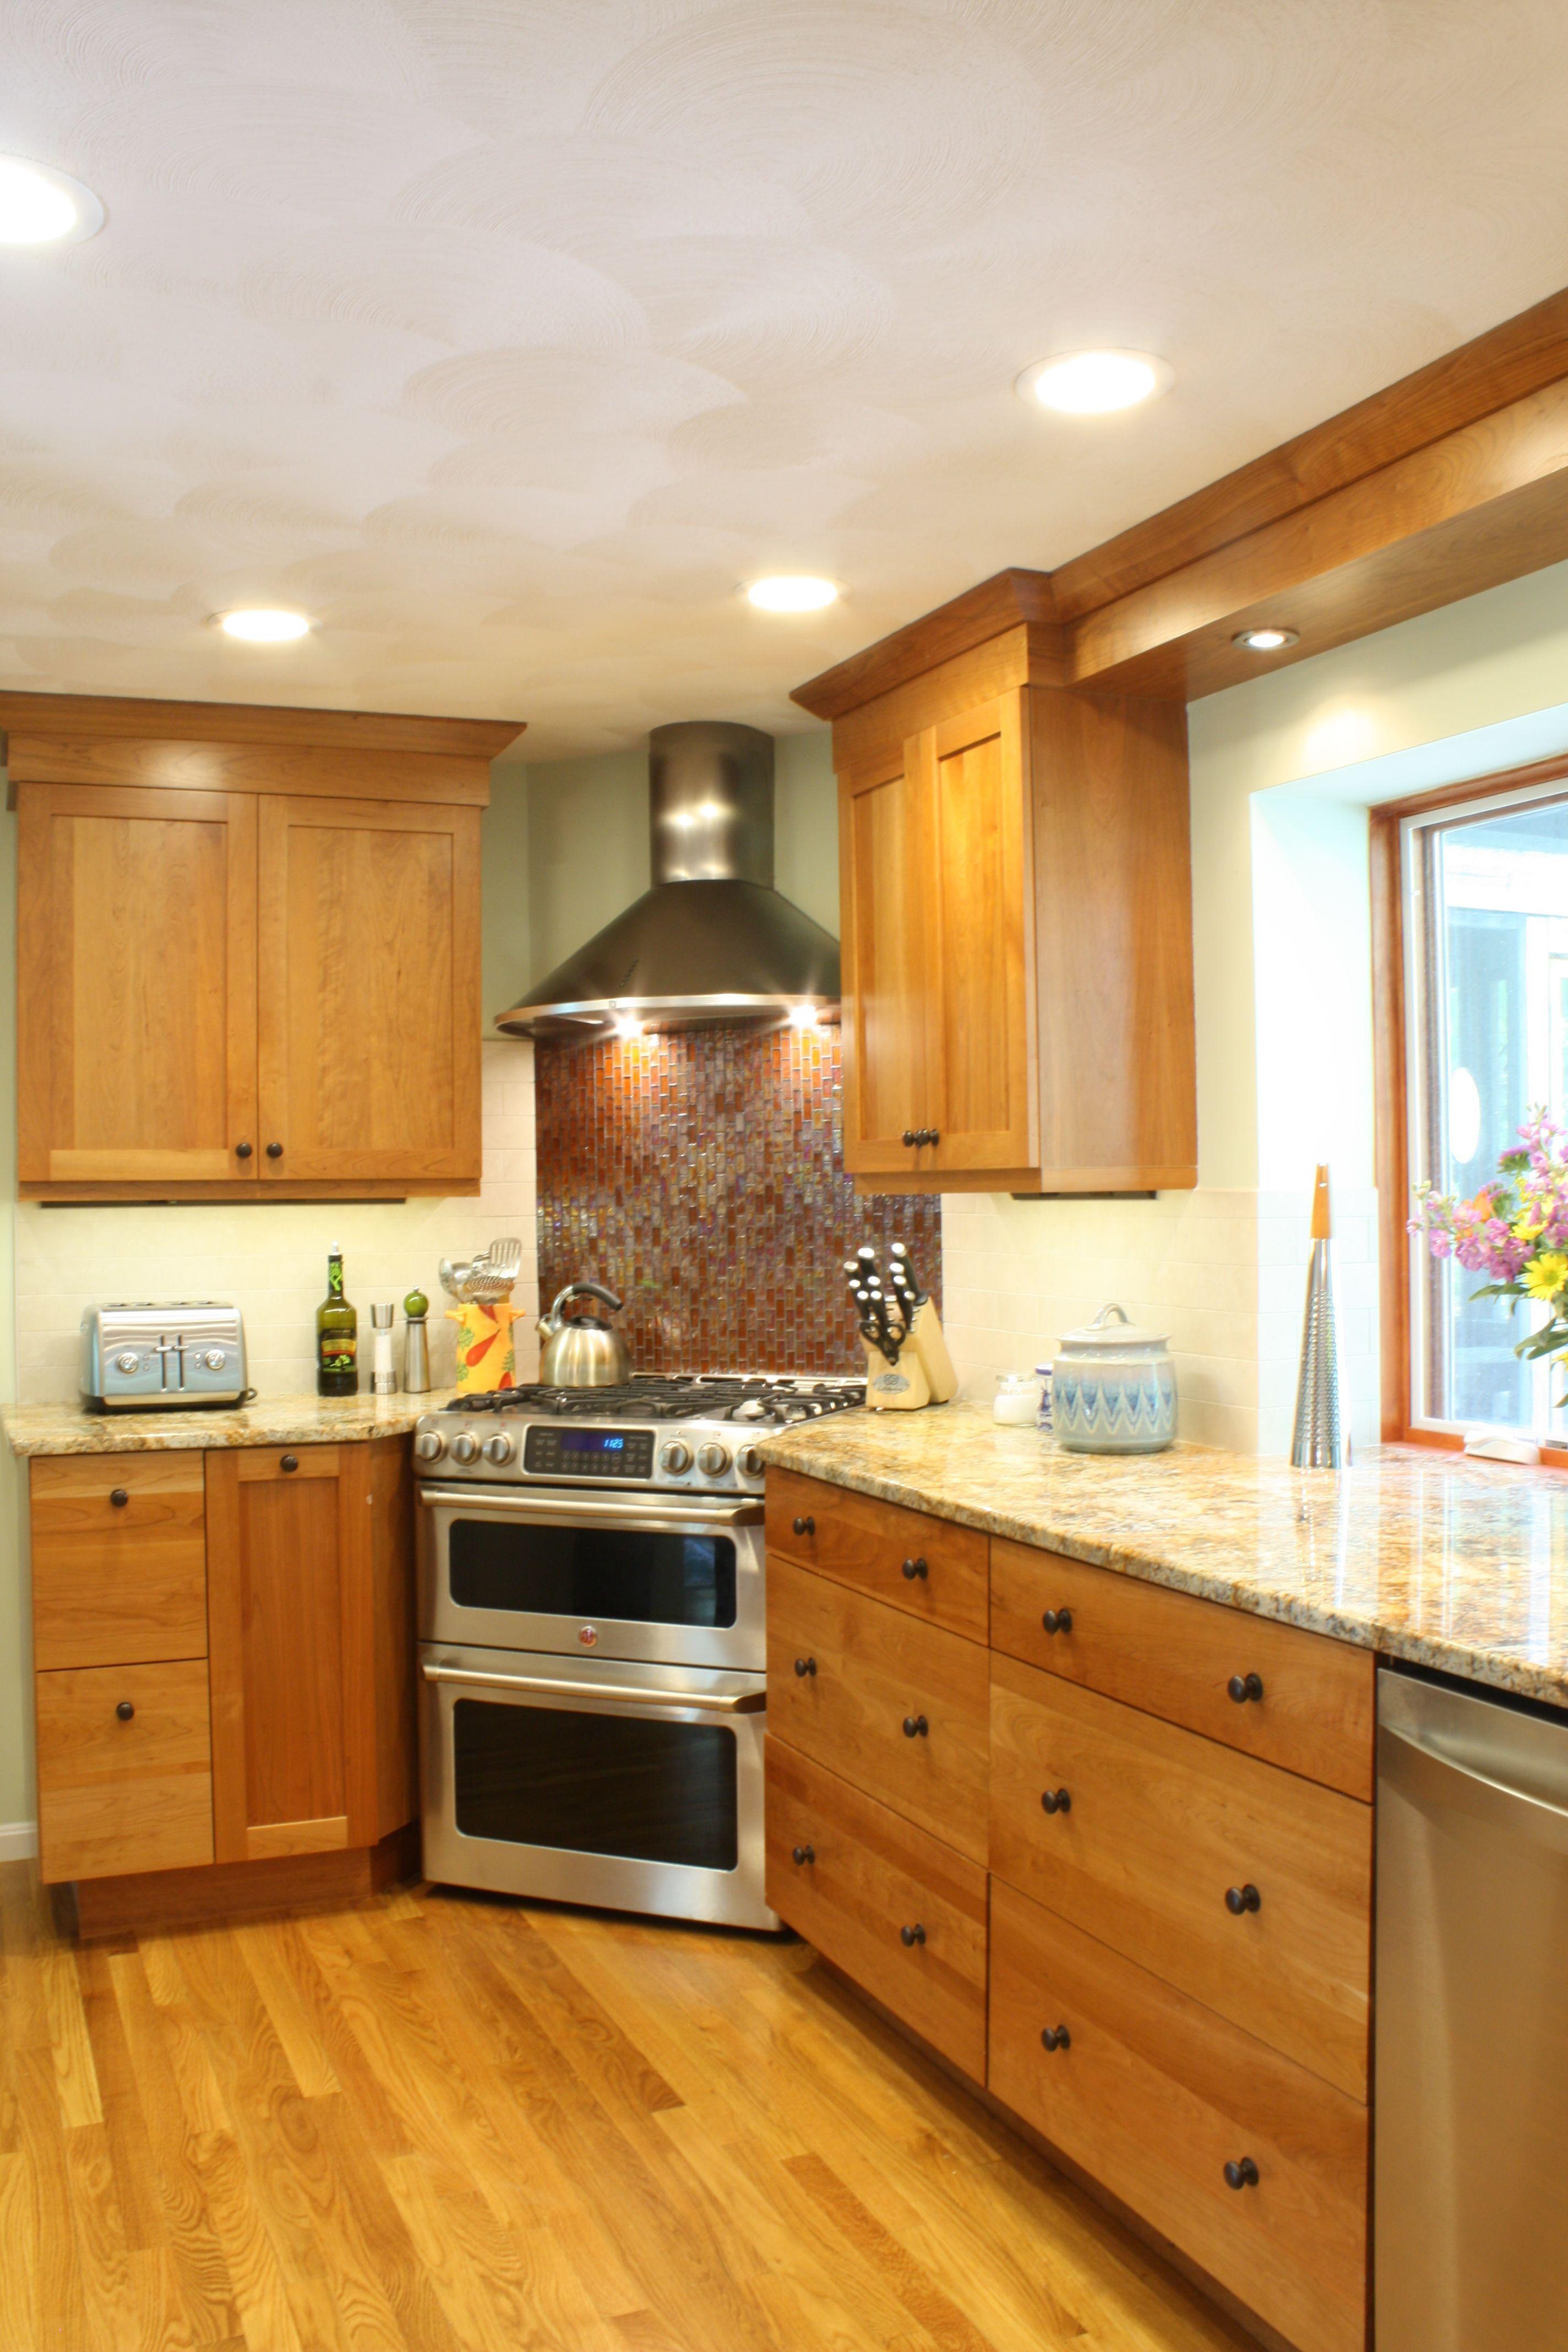 Cherry wood kitchen corner stove and corner sink stainless steel